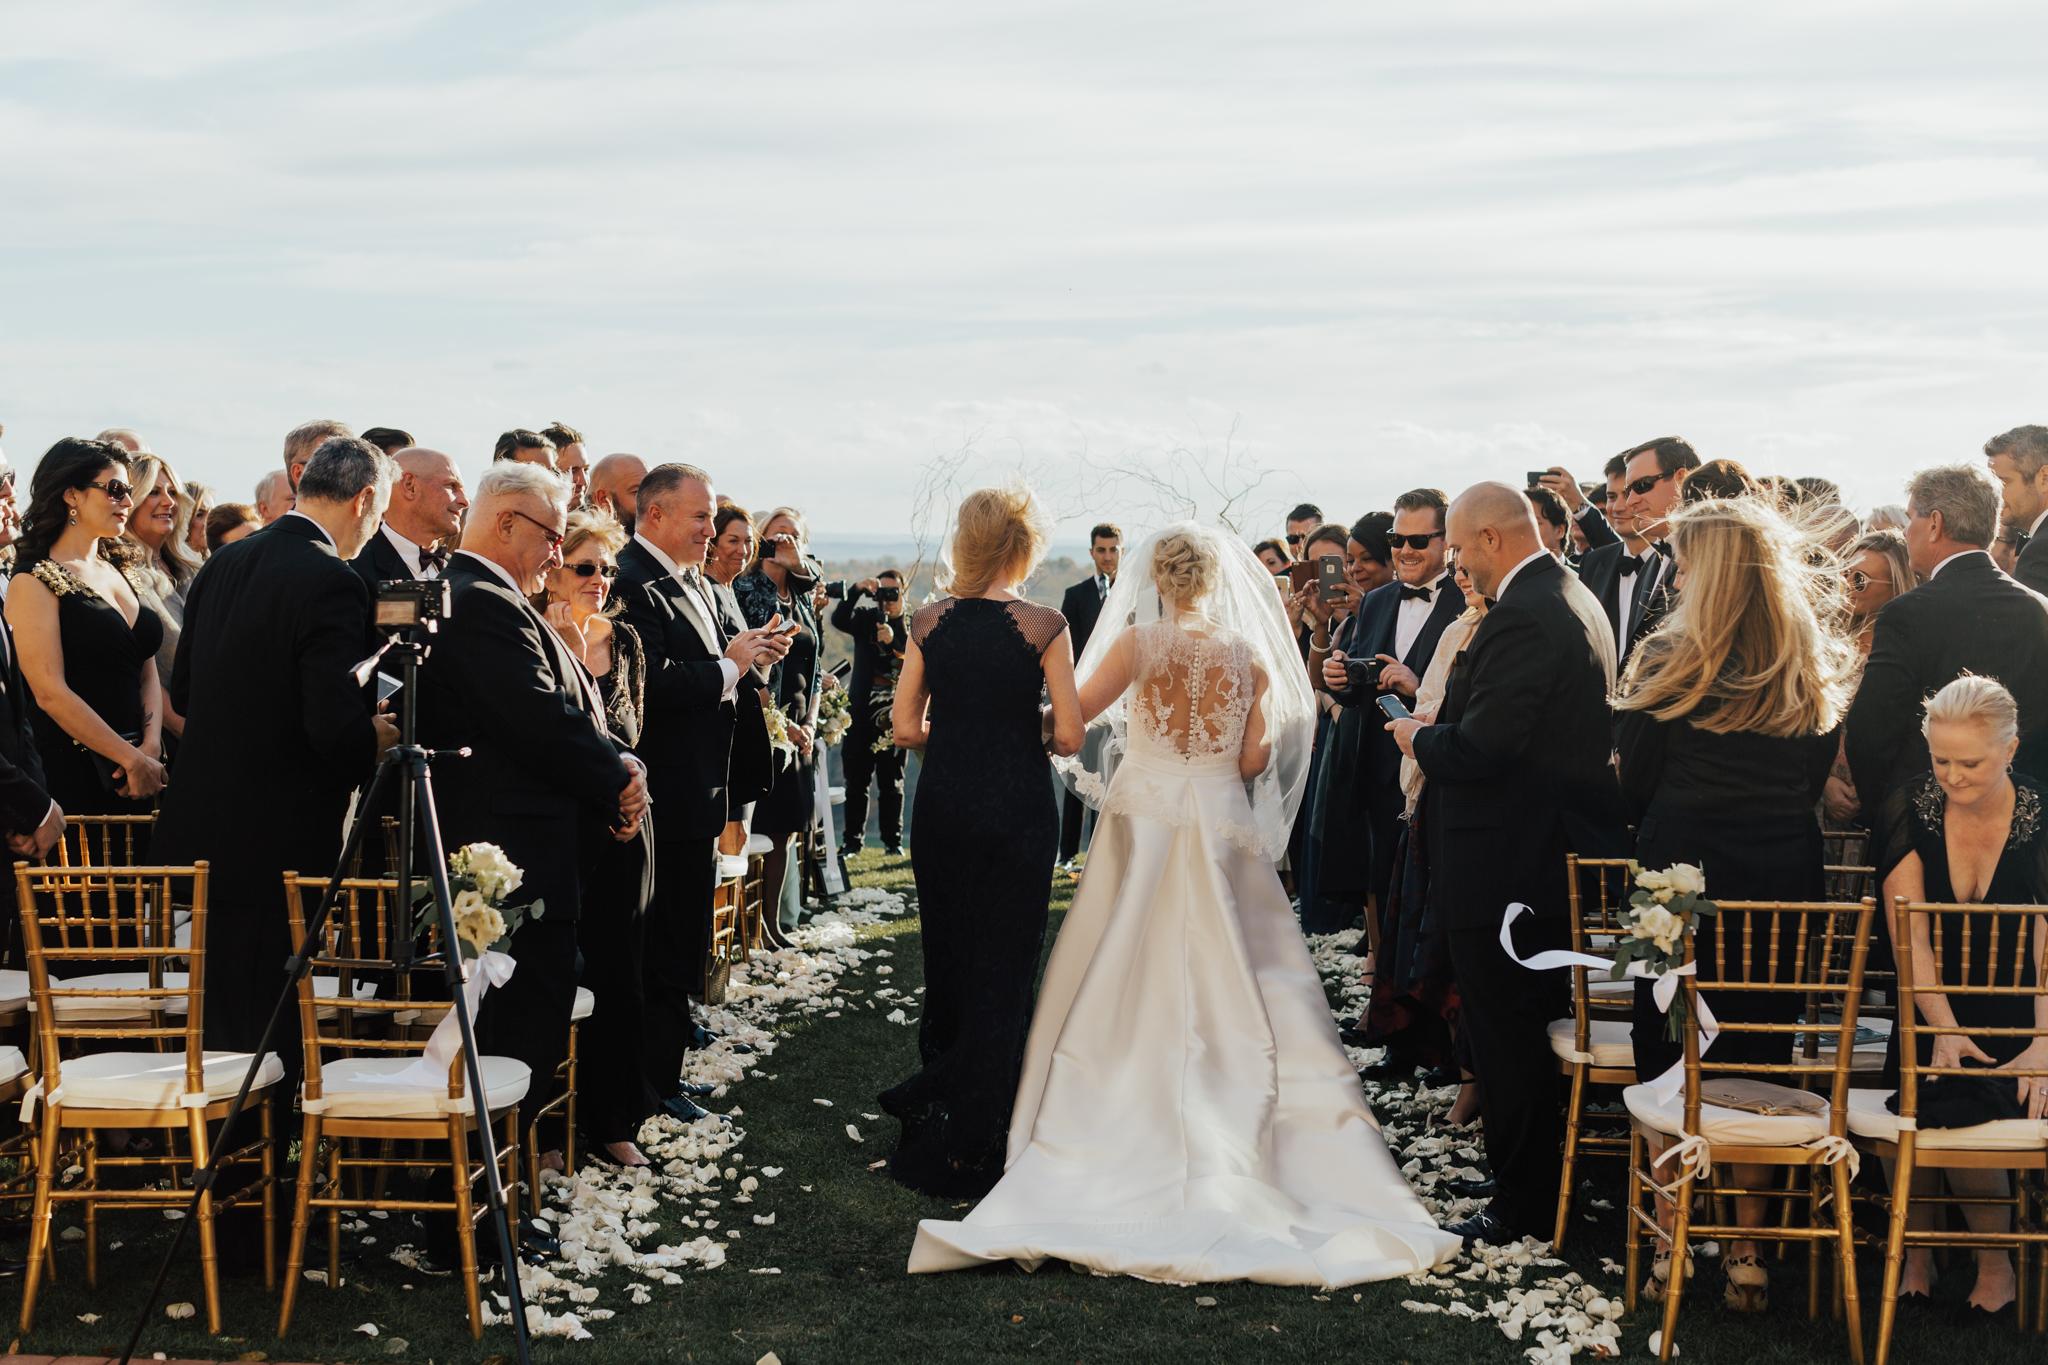 bhldn lace wedding dress new york